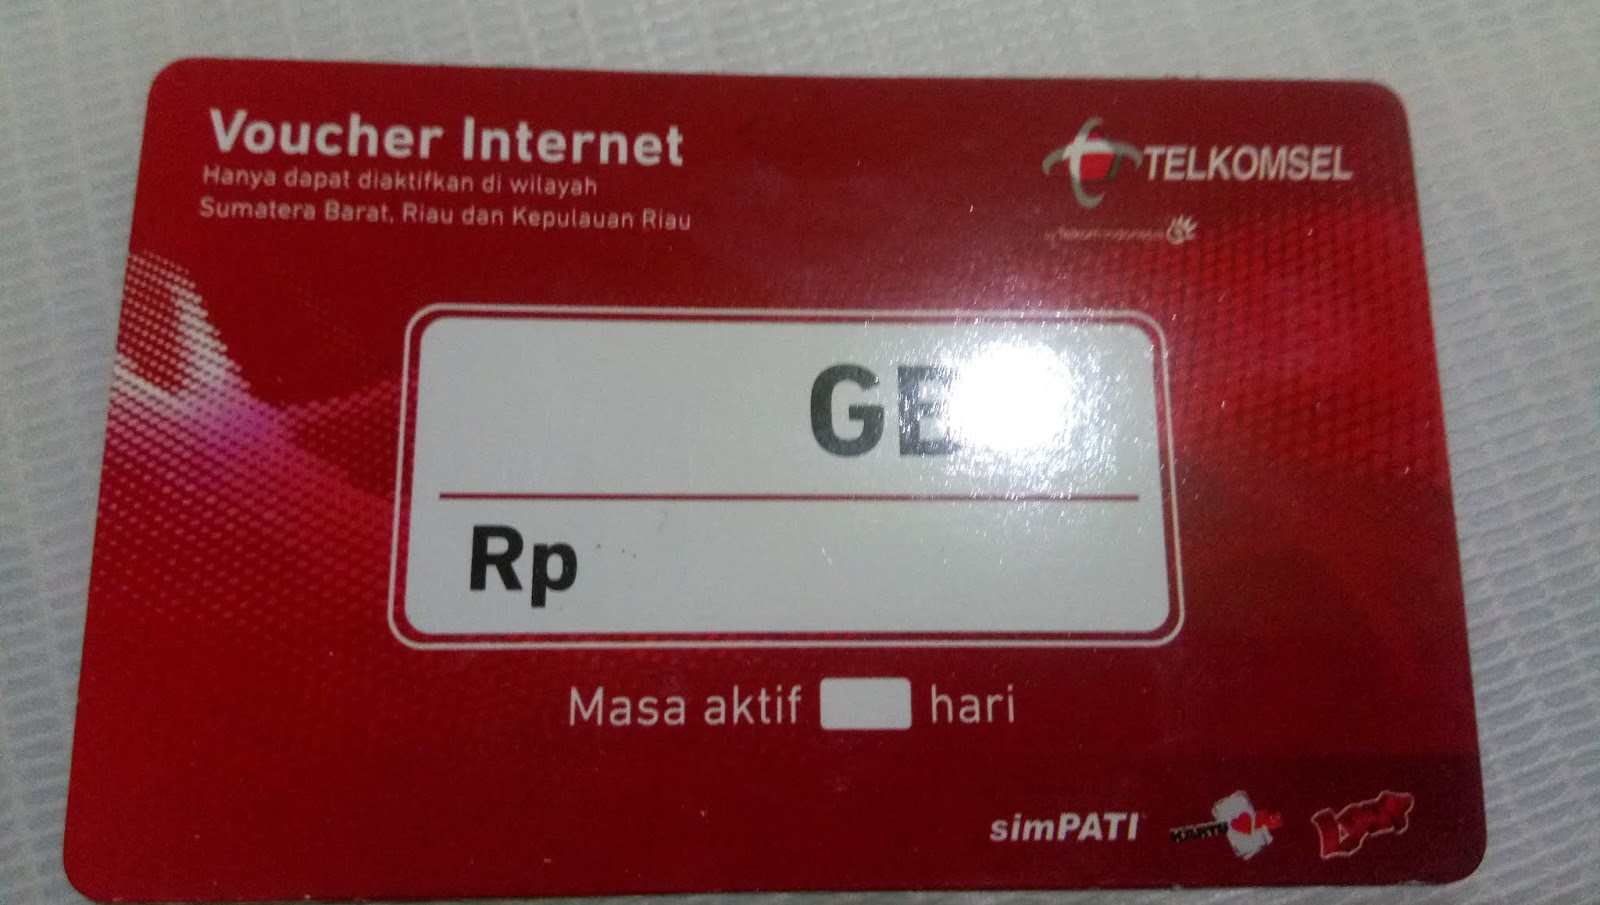 Cara Mengisi Voucher Internet Telkomsel Axis Tri Smartfren Dan Xl Cara Mengisi Paket Internet